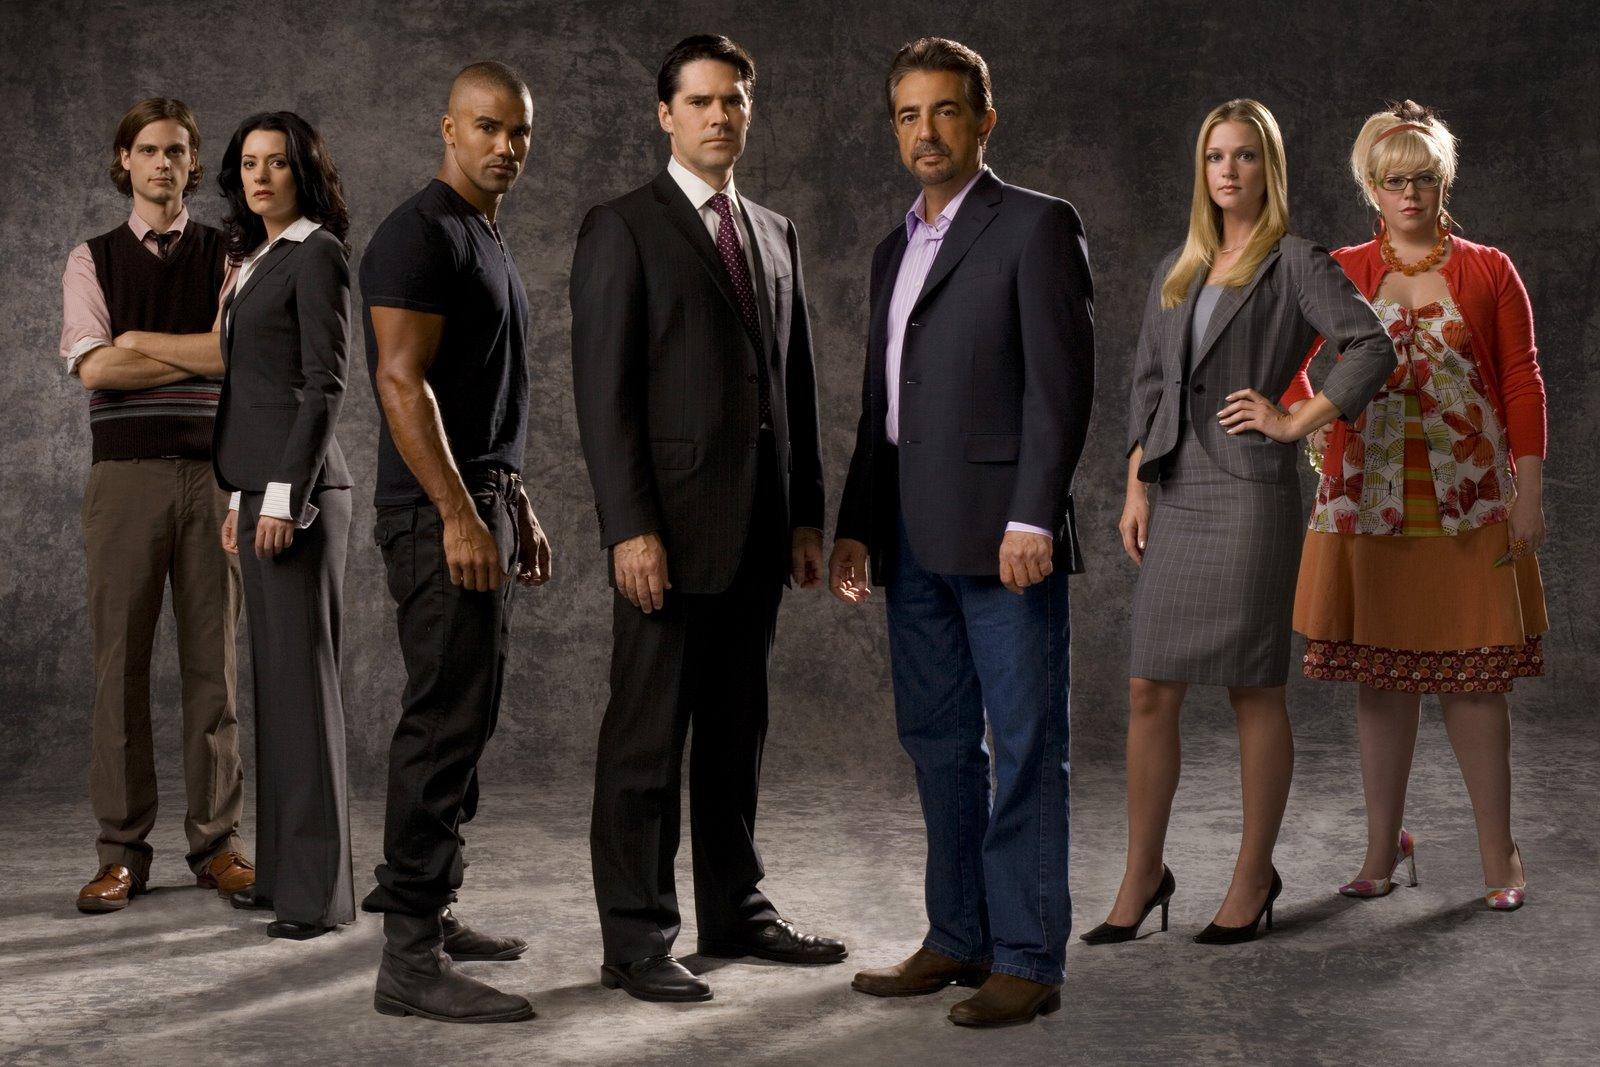 [影集] Criminal Minds (2005~) Criminal%20Minds%20004